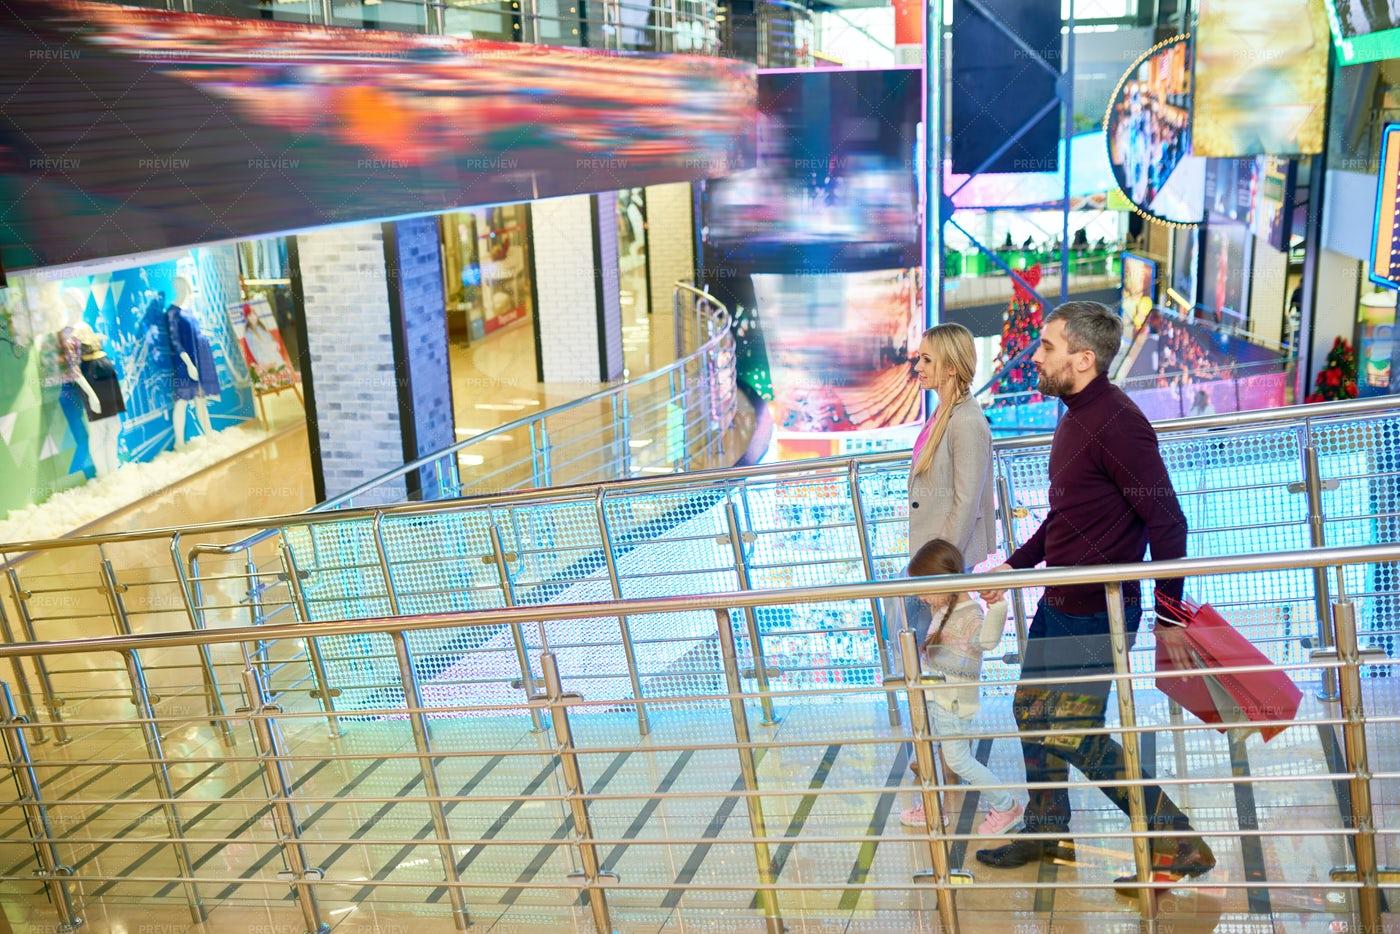 Modern Family In Shopping Mall: Stock Photos